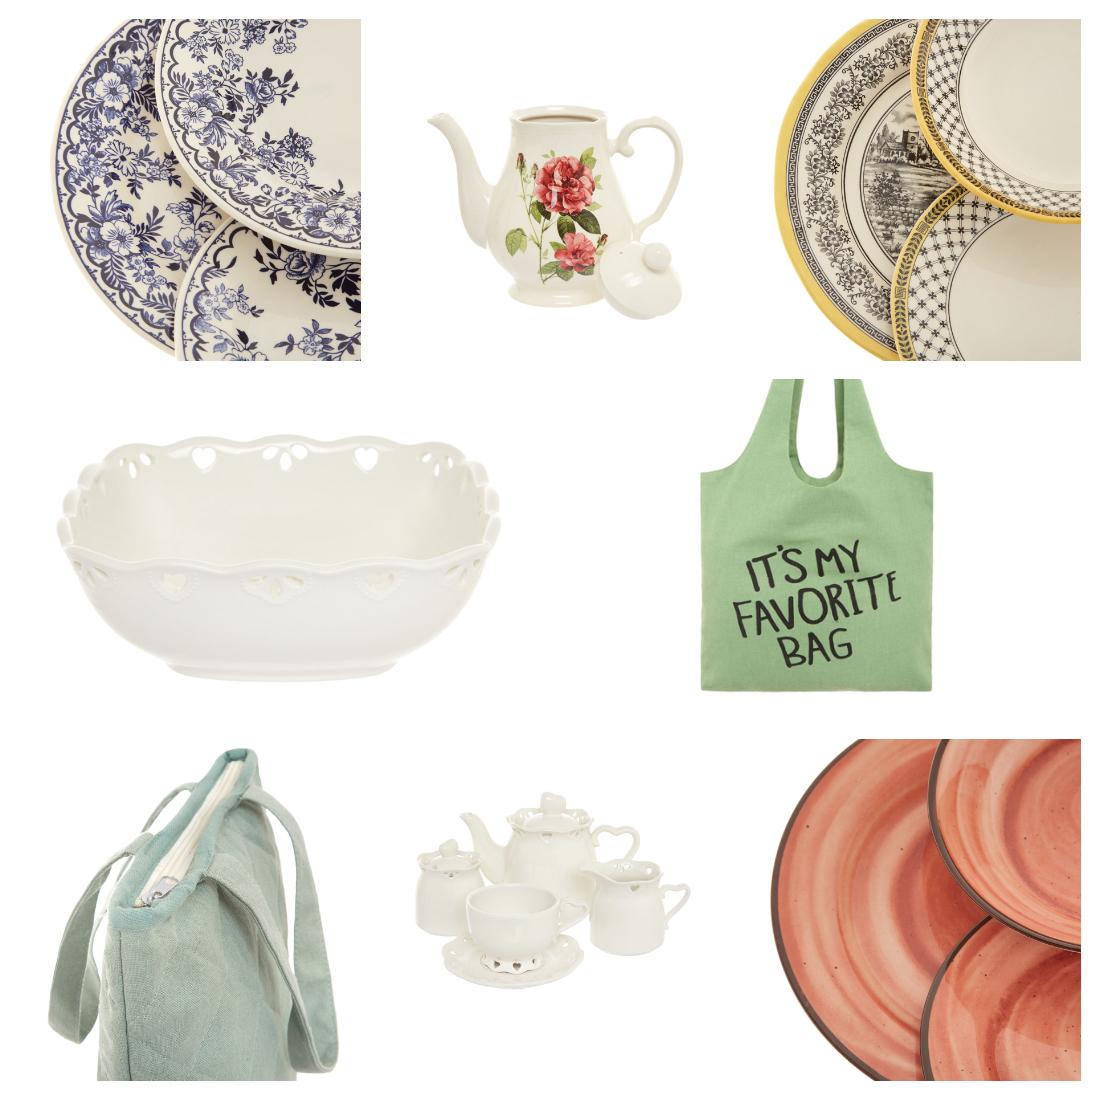 Accessori cucina, collezione Aria di Bianco - Foto by Coincasa